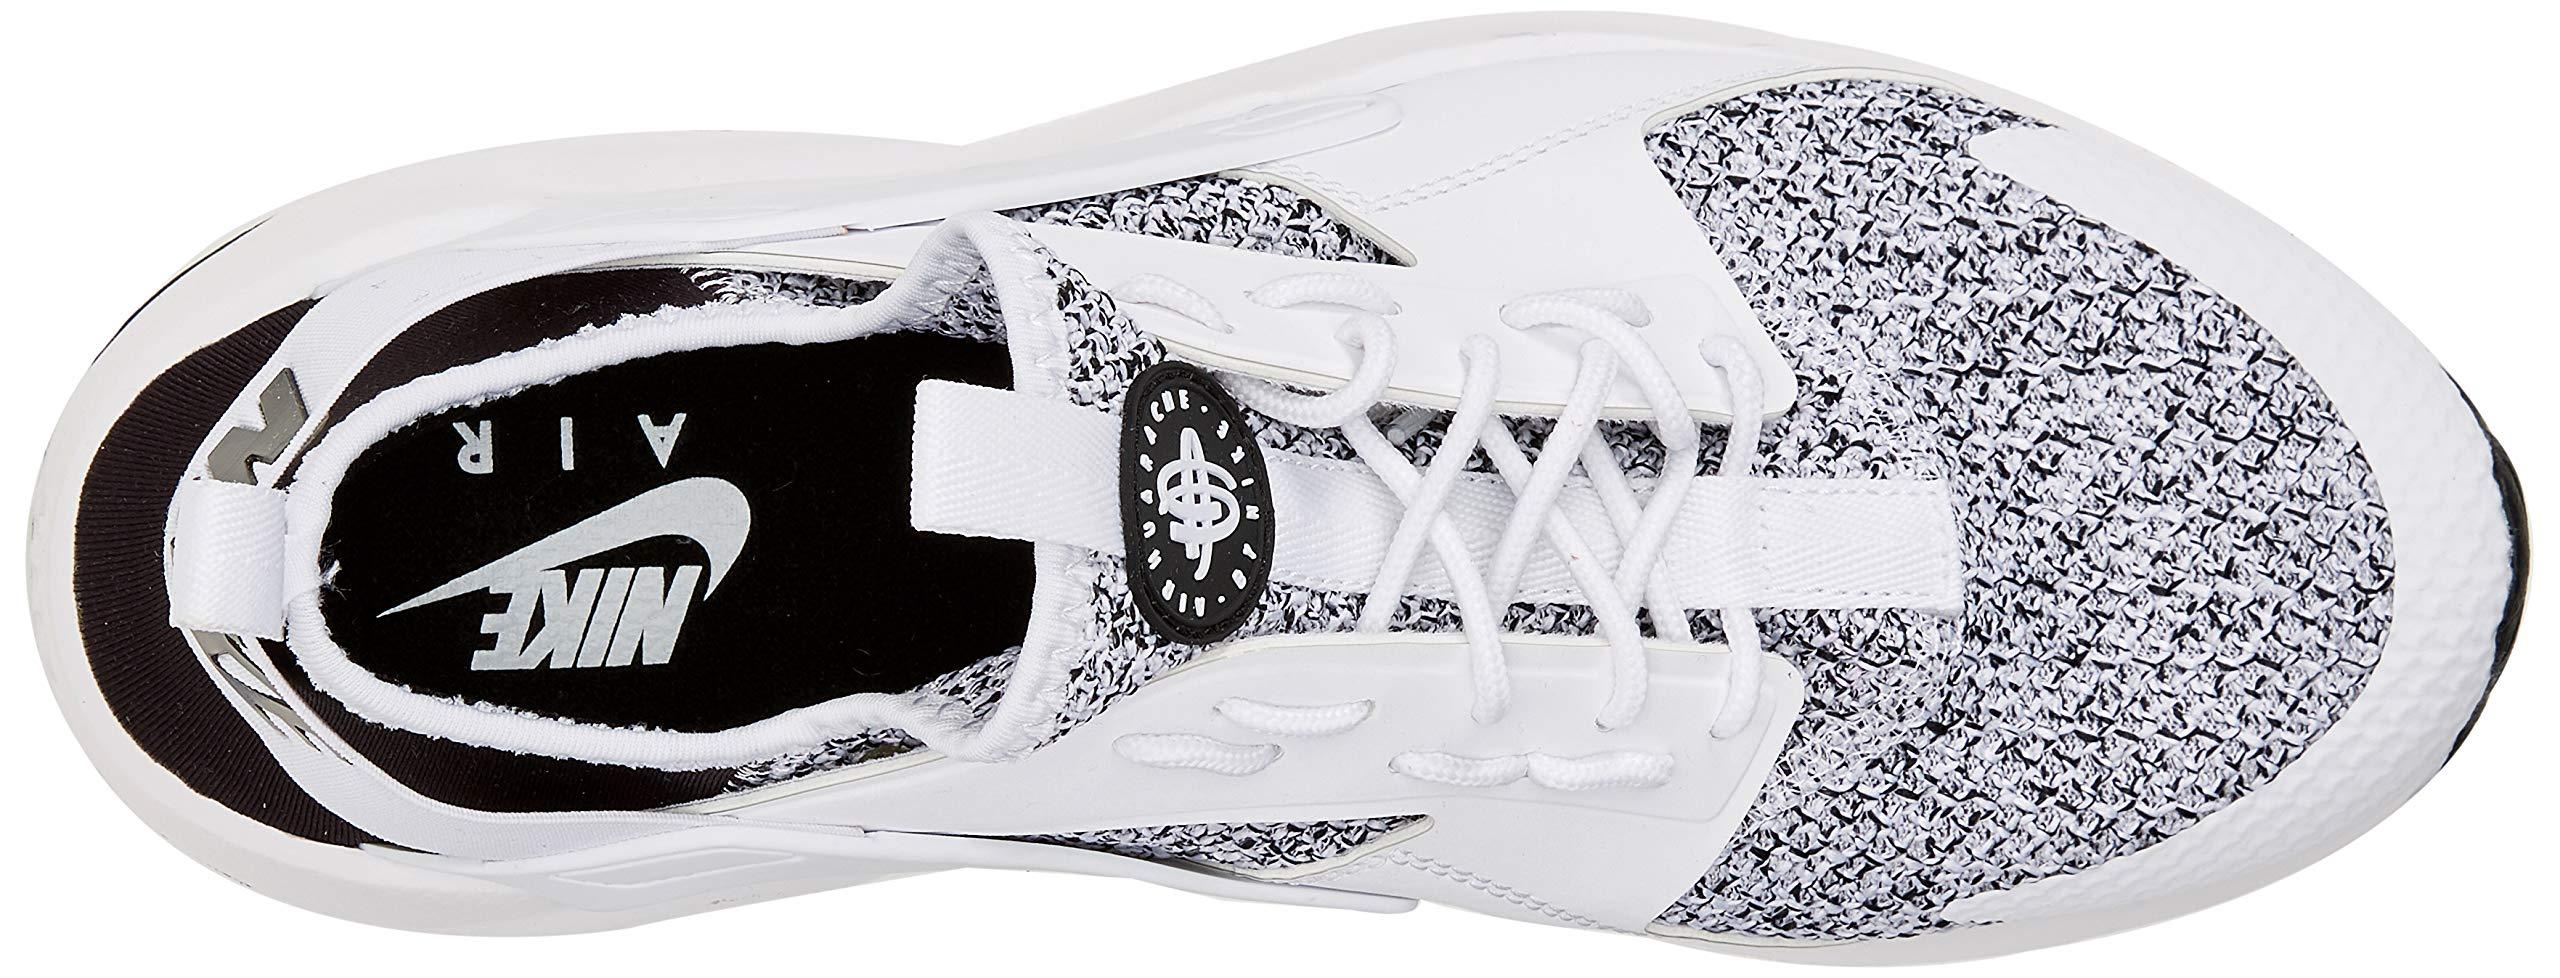 81SrvsD68IL - Nike Men's Air Huarache Run Ultra Se Gymnastics Shoes